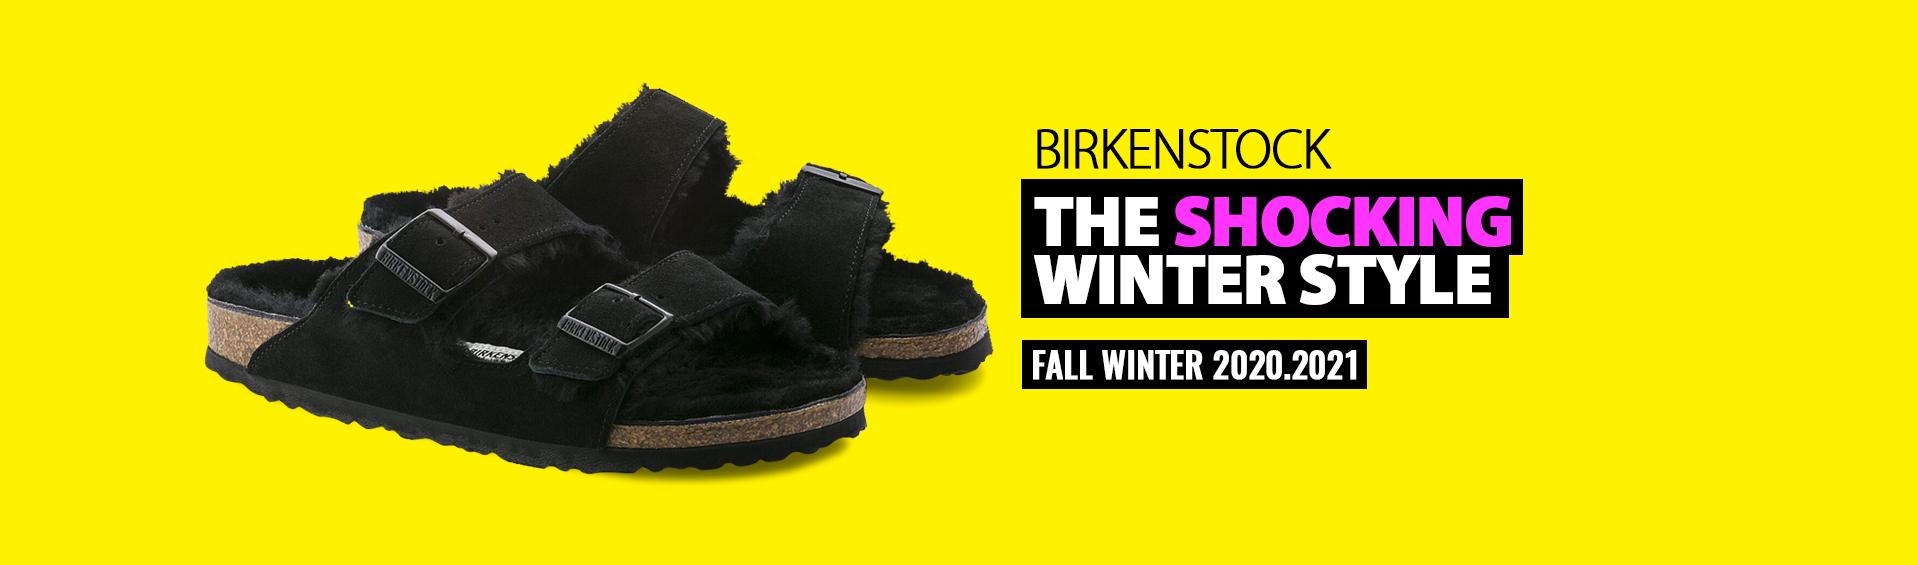 Birkenstock-shocking-winter-style-calzature-firenze1